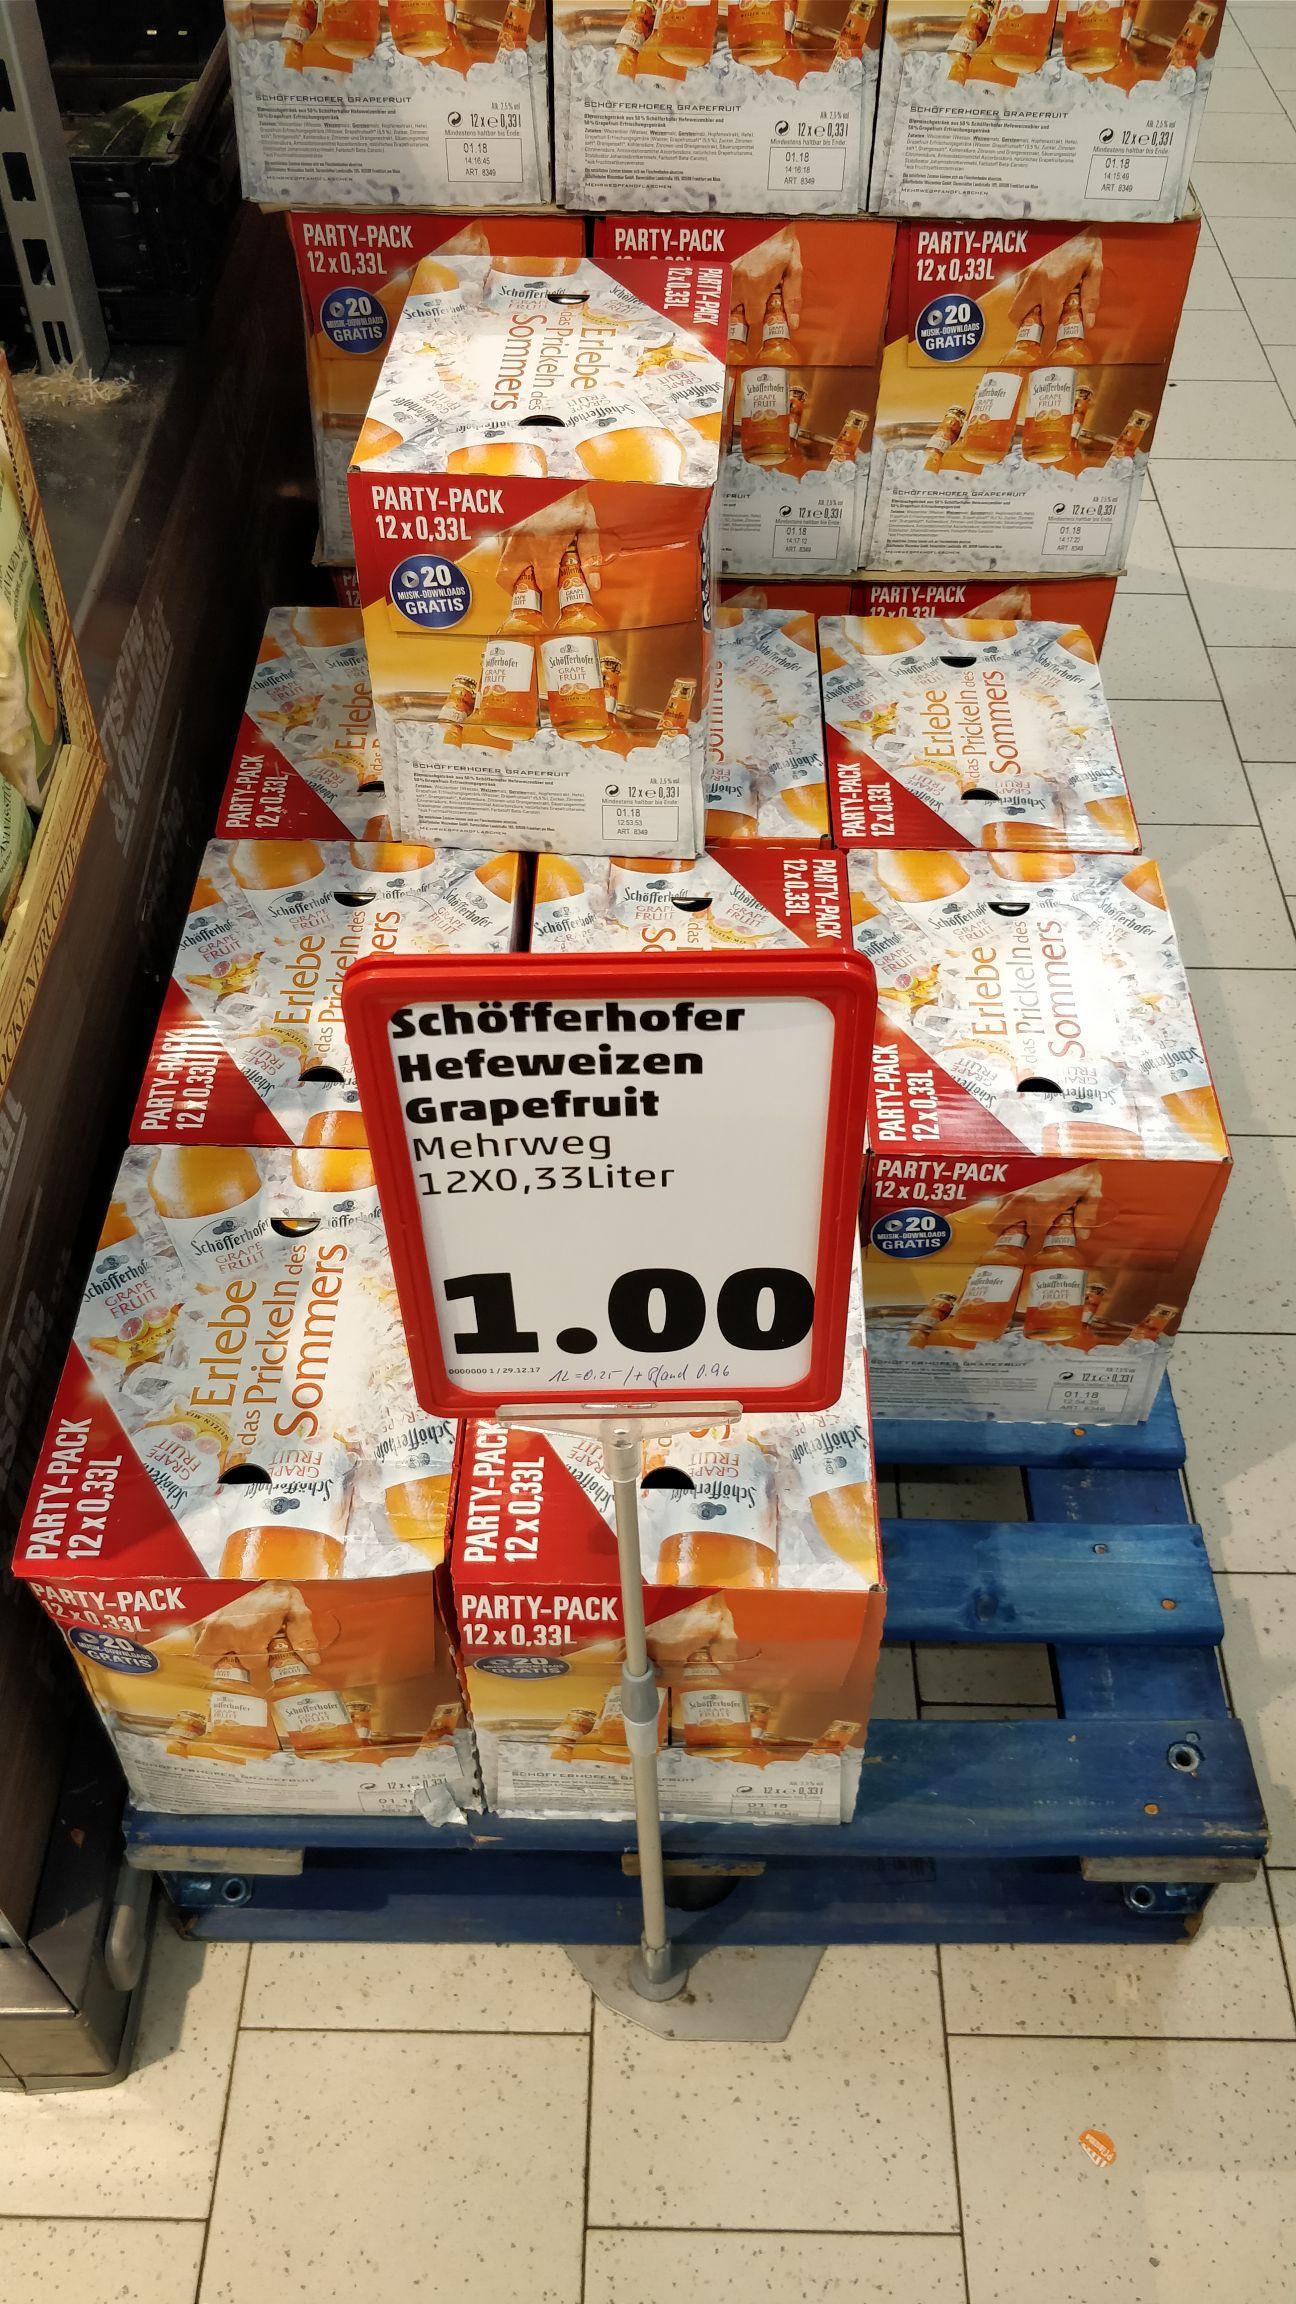 Lokal Regensburg Schöfferhofer Hefeweizen Grapefruit